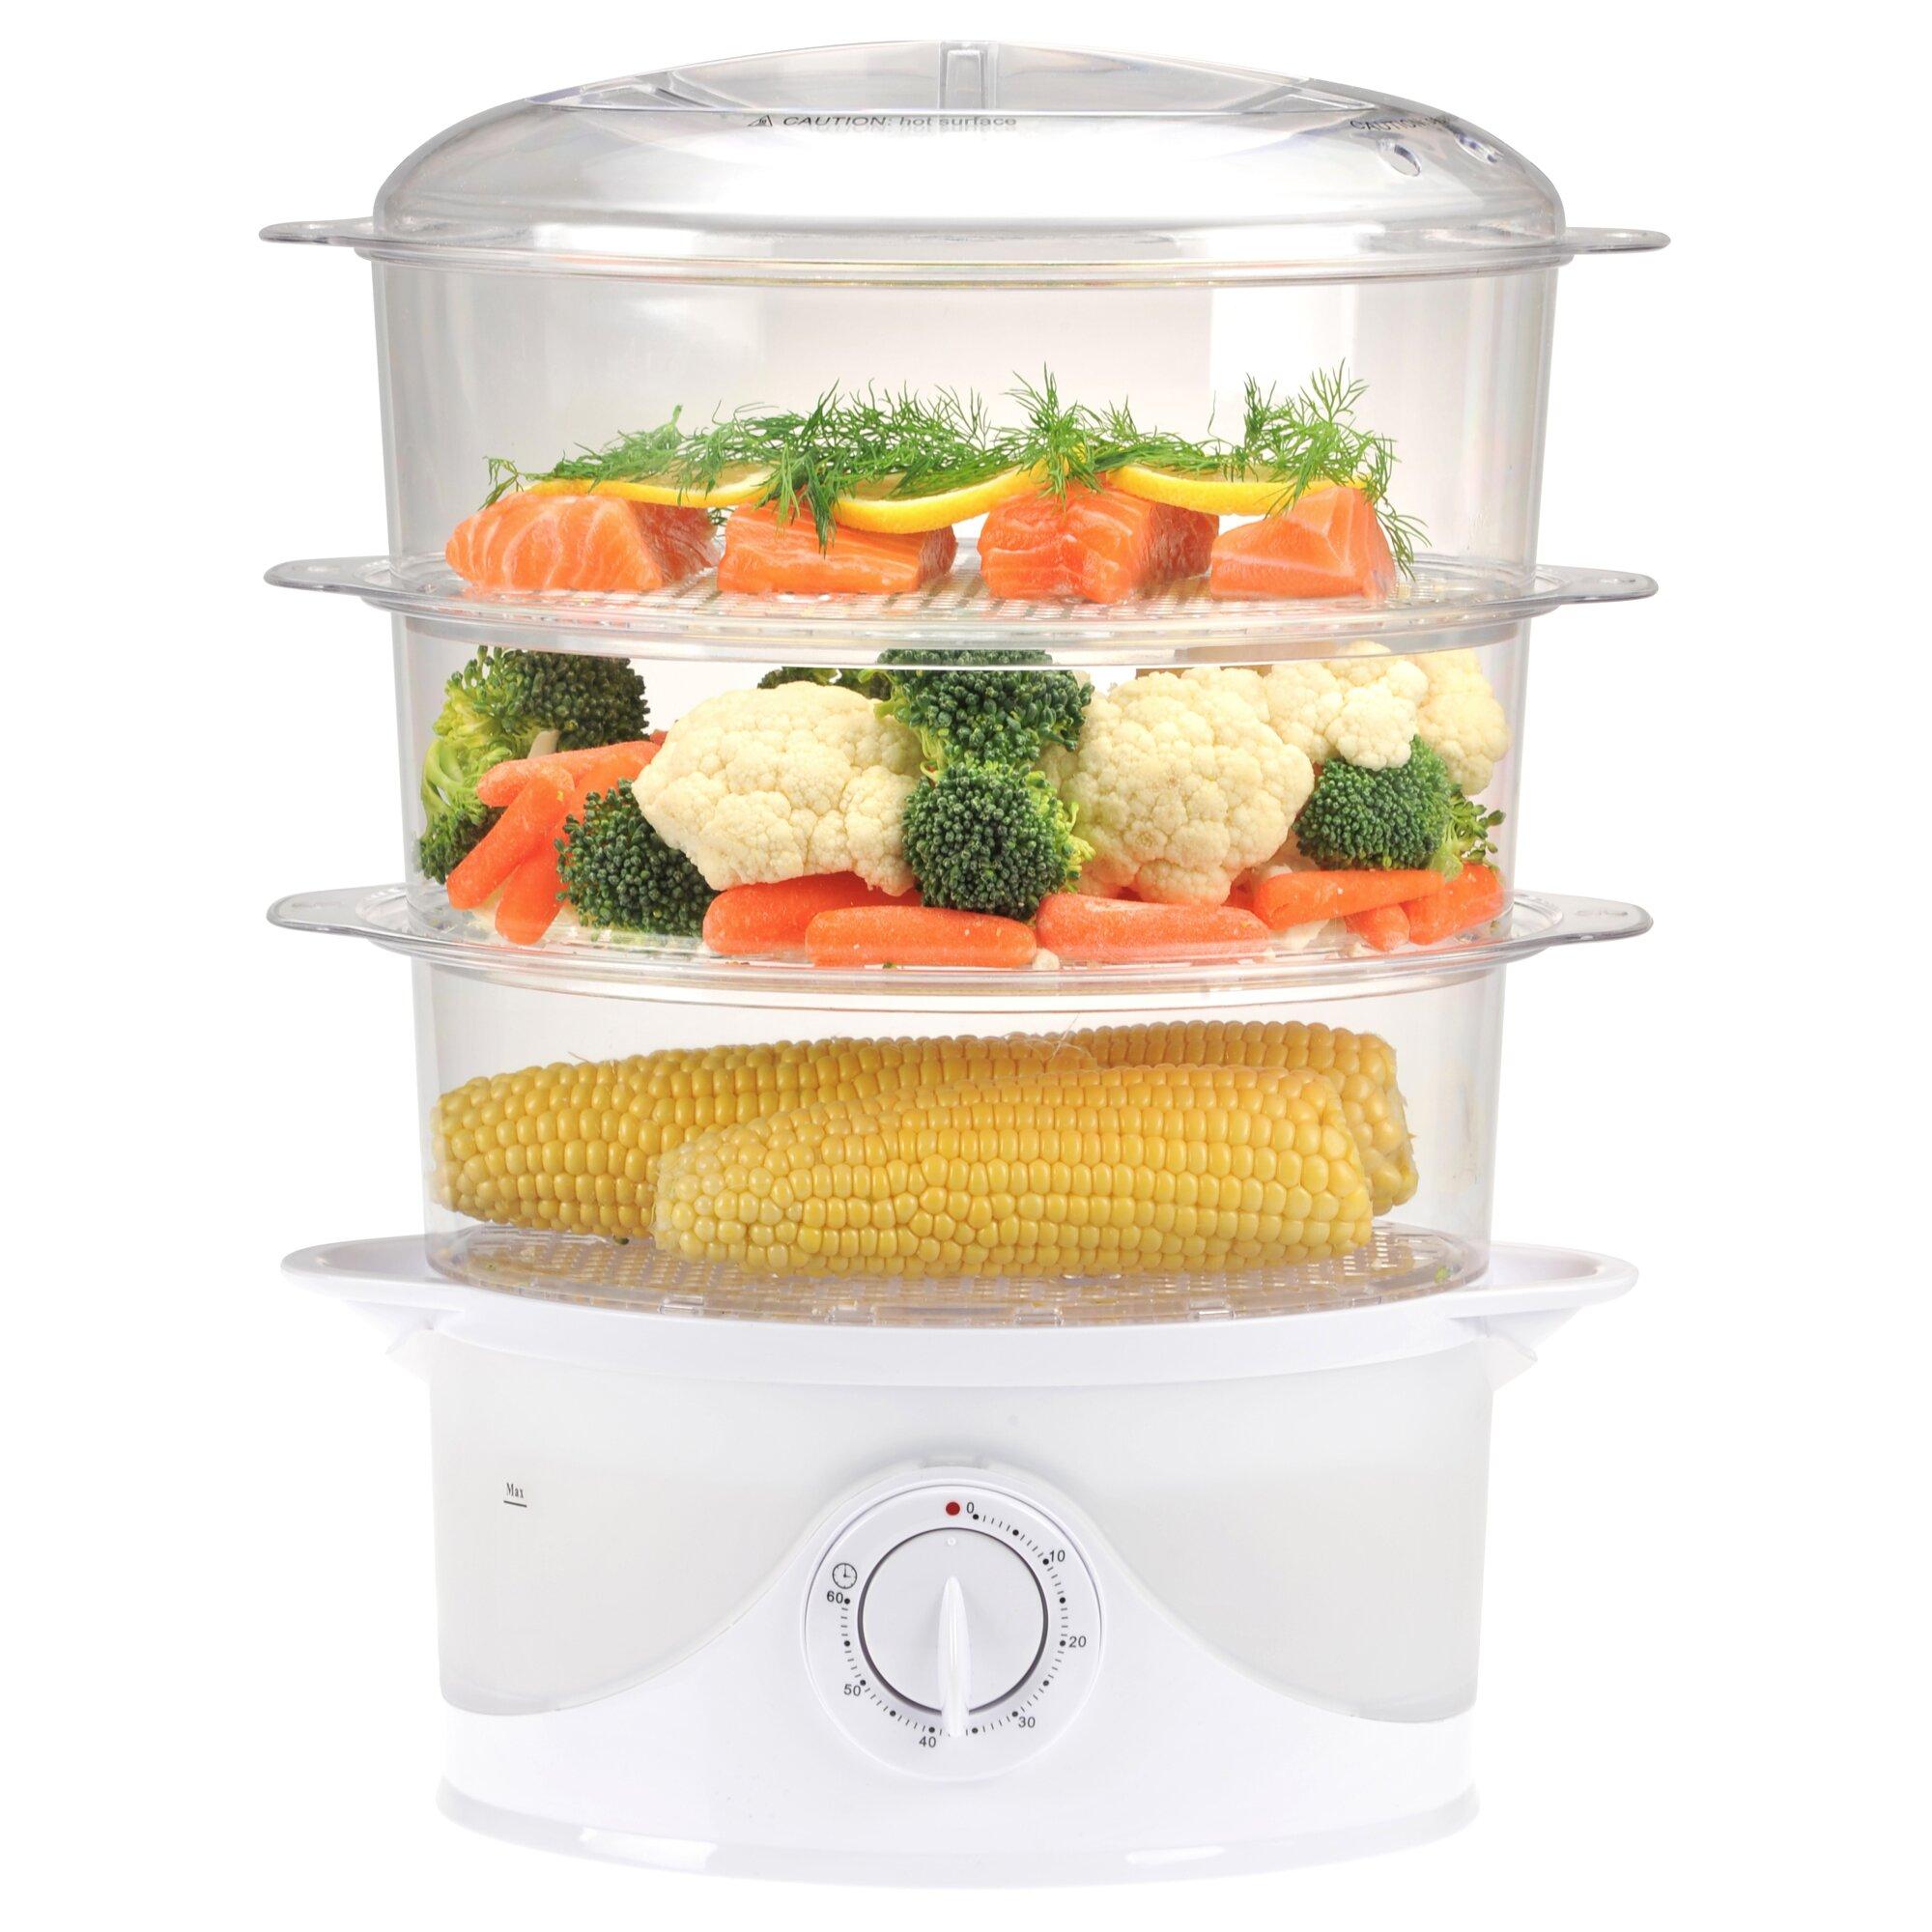 Uncategorized Kitchen Steamer Appliance kalorik 3 tier 9 5 qt food steamer reviews wayfair steamer